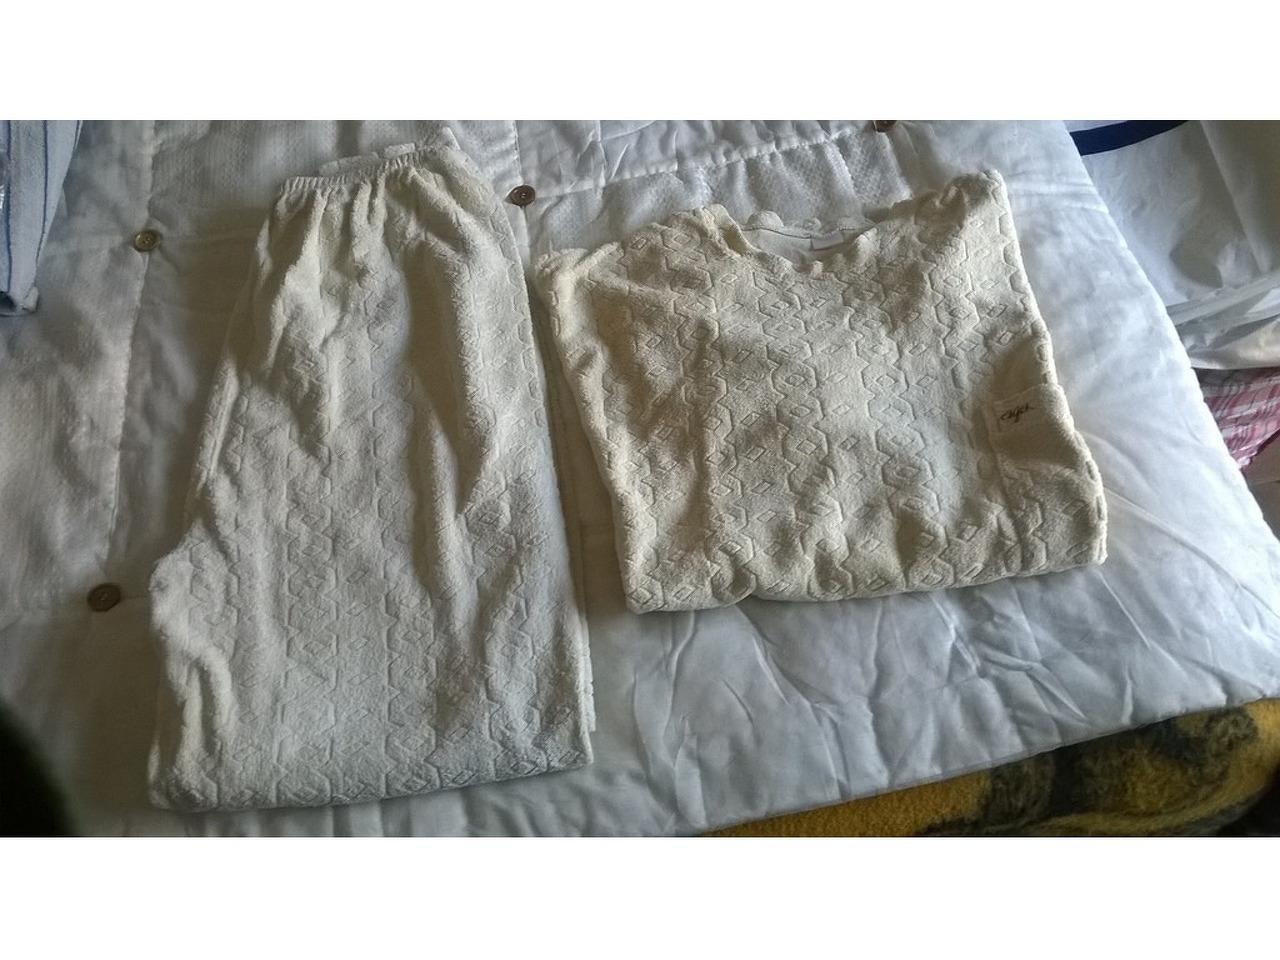 Pijamas (segunda mão) - 6/12